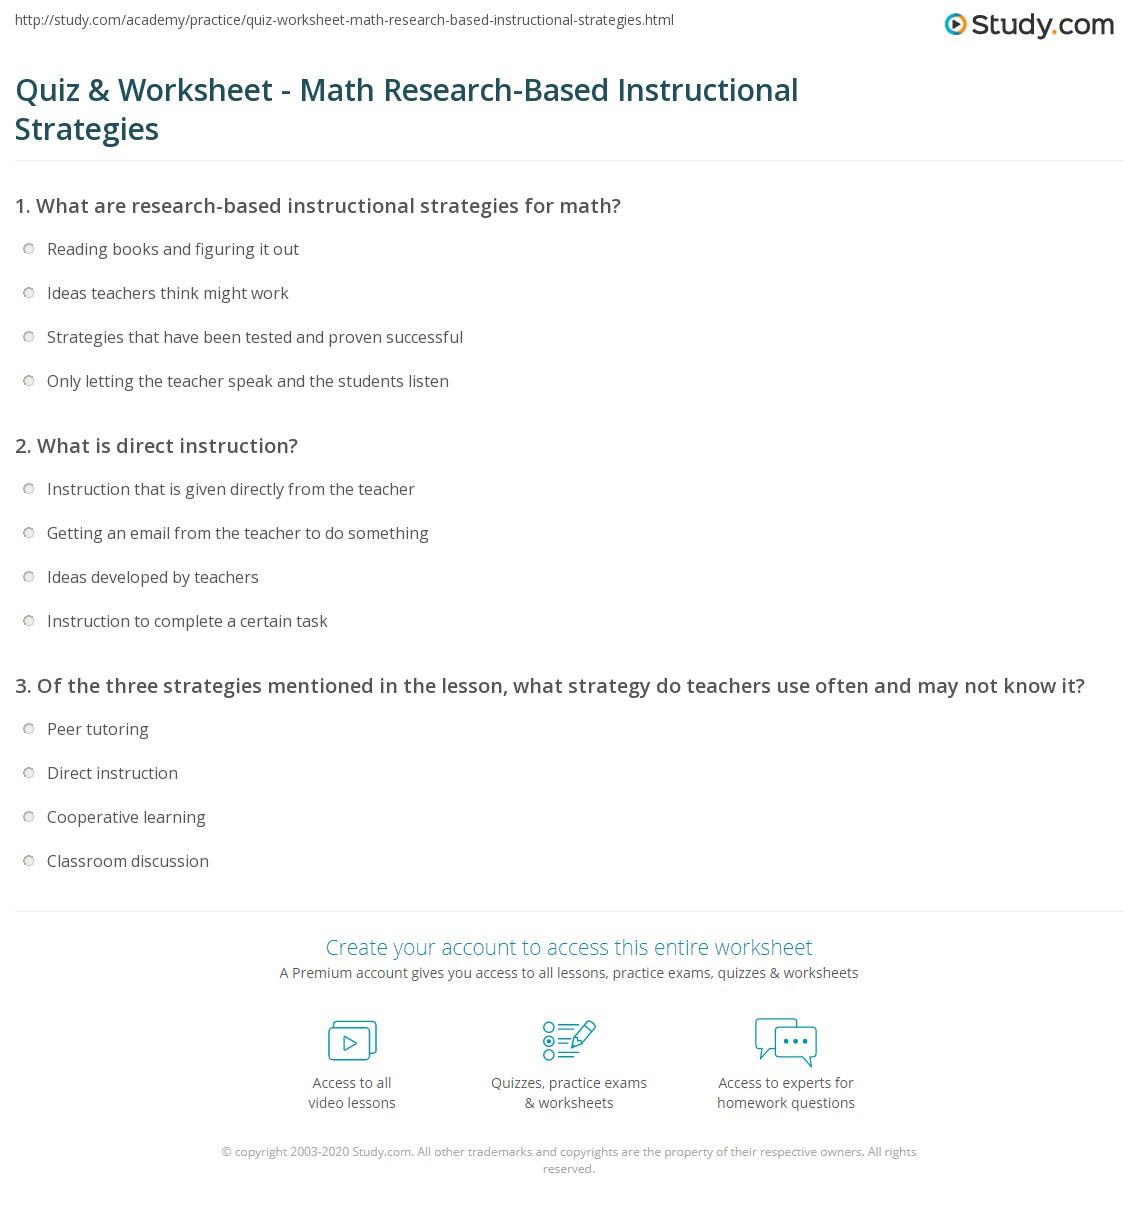 Quiz Worksheet Math Research Based Instructional Strategies